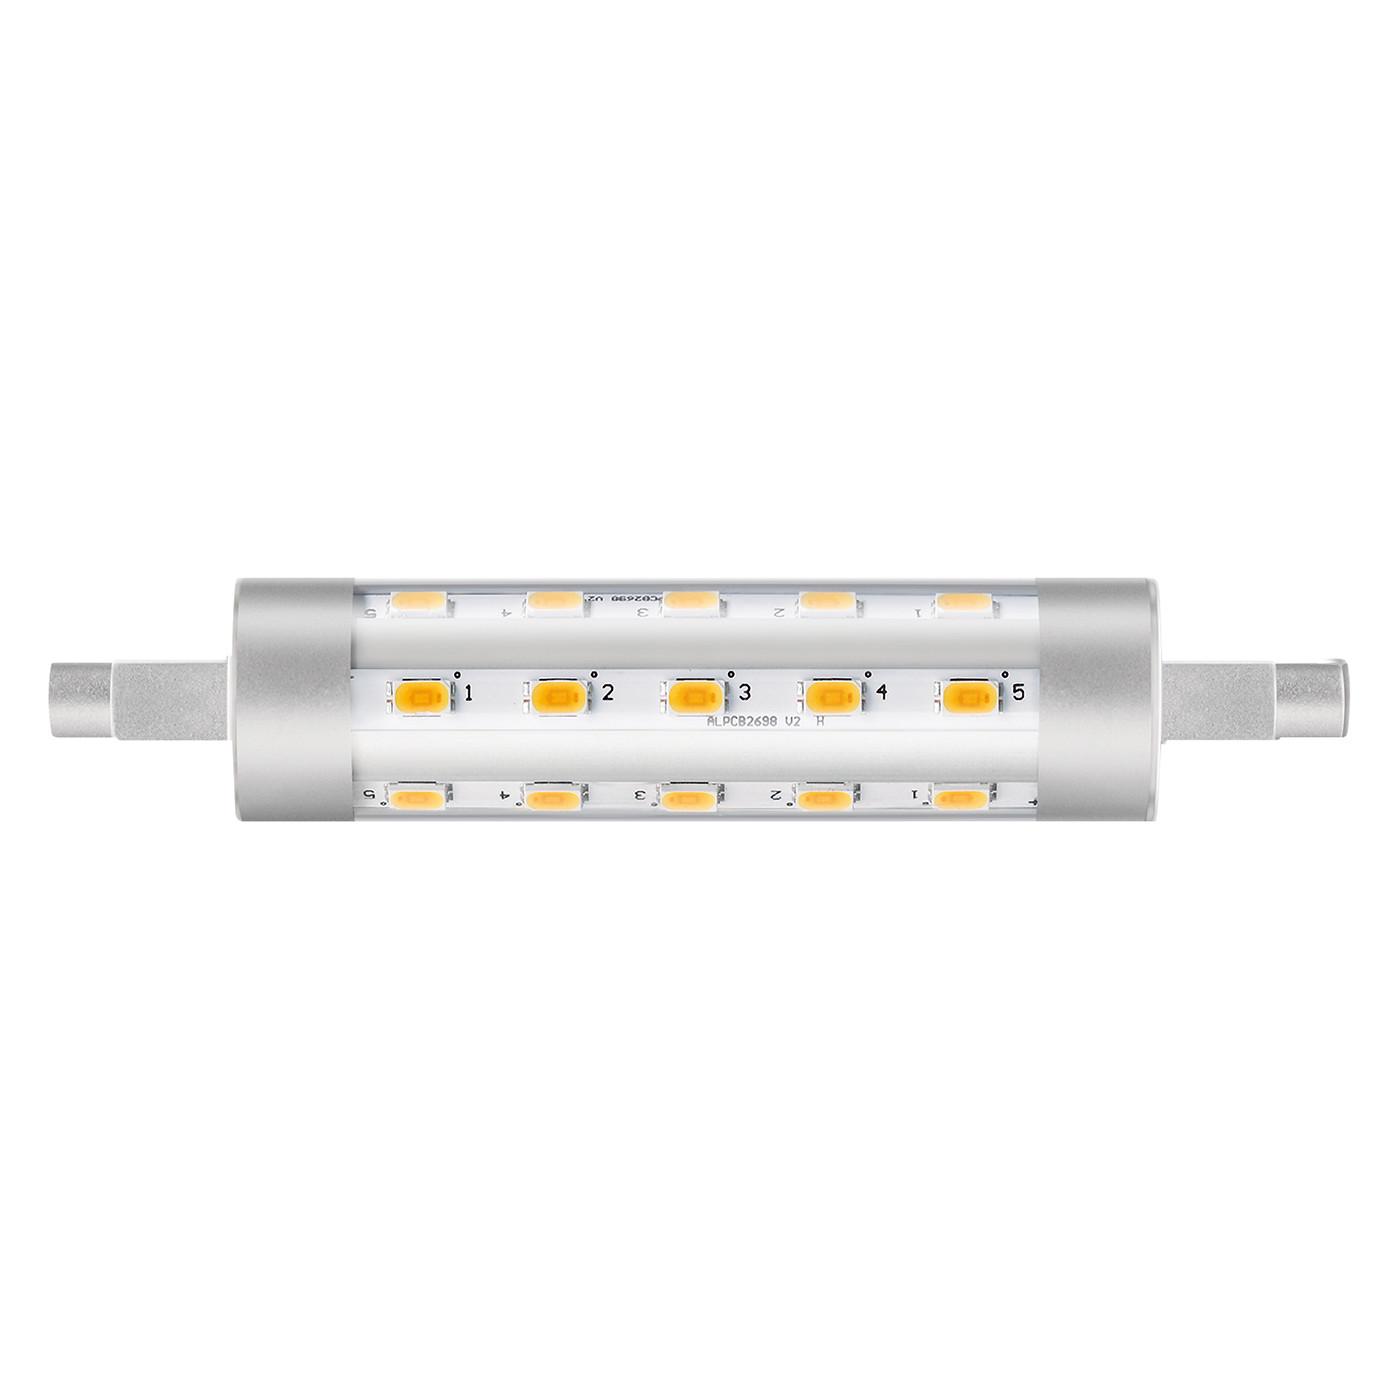 Philips LED-Stablampe 6,5W 3000K 220-240V R7s 118 mm (entspricht der herkömml. 60W Lampe)